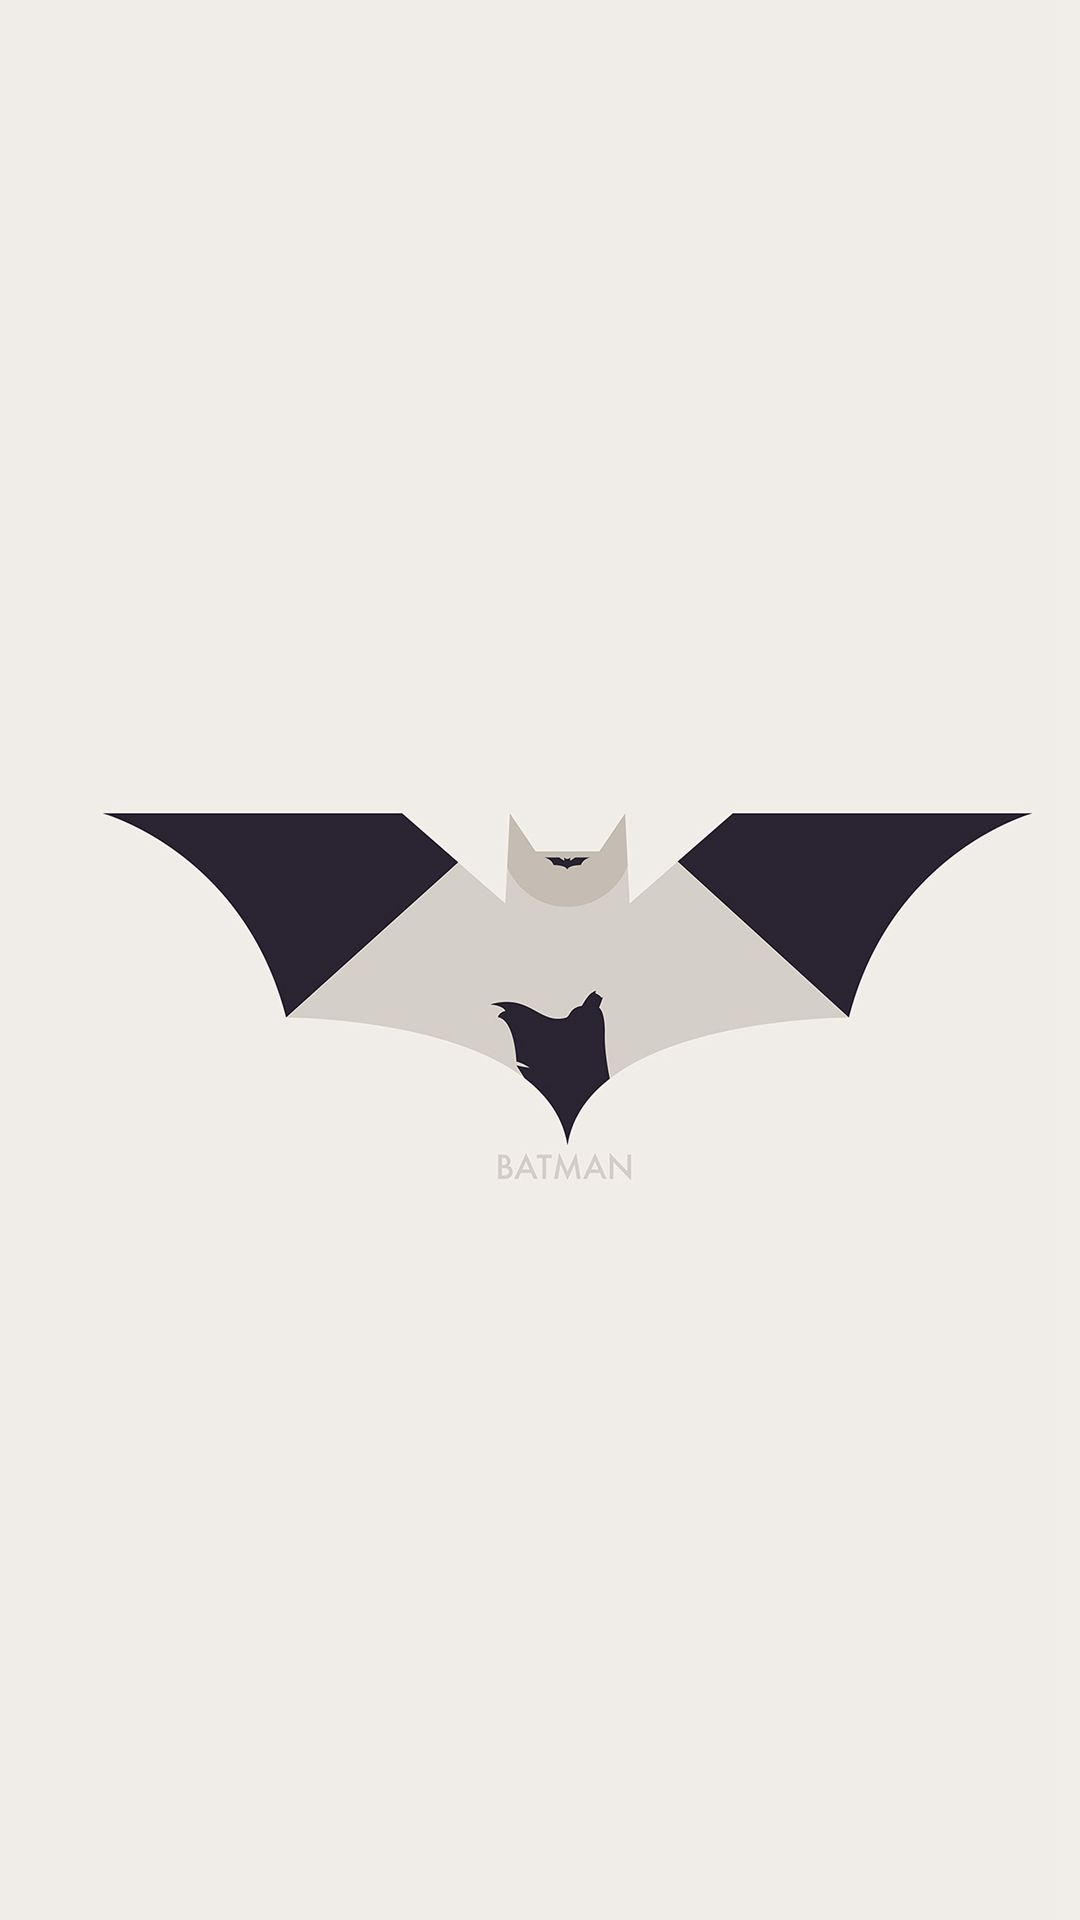 art batman minimal logo illust iphone 6 wallpaper nice